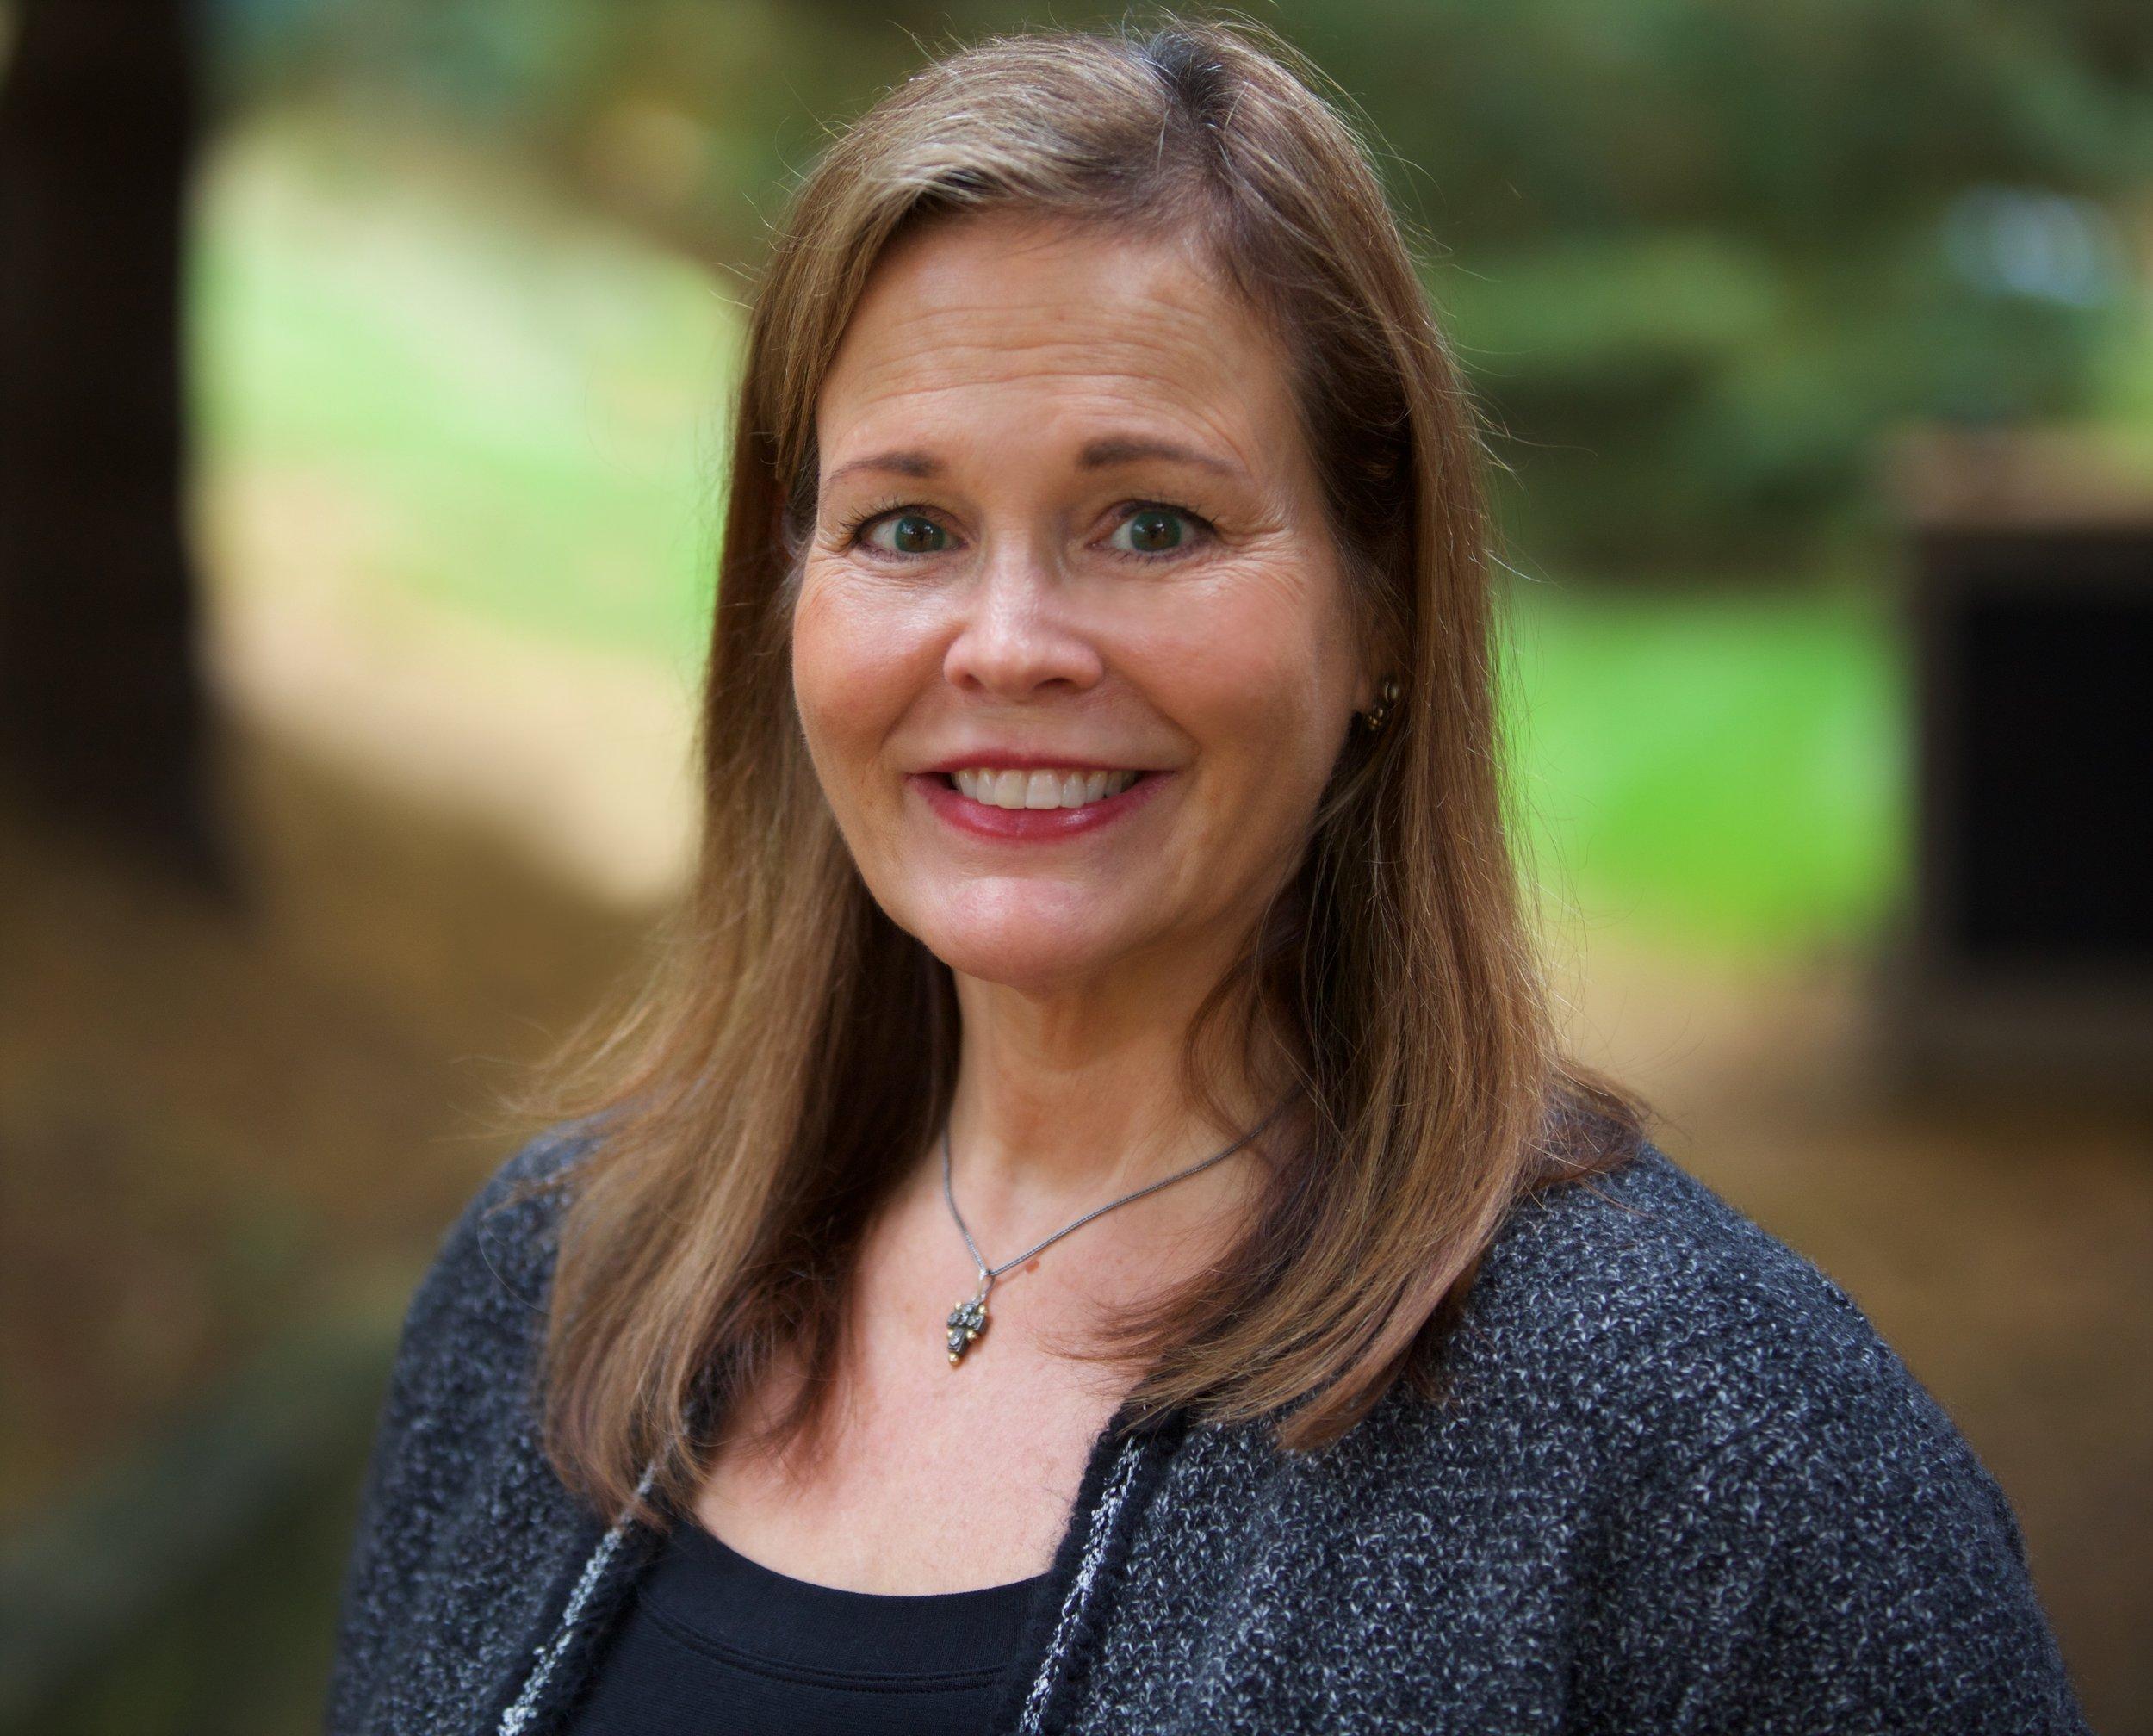 Linda Toscano Executive Director, Business Development